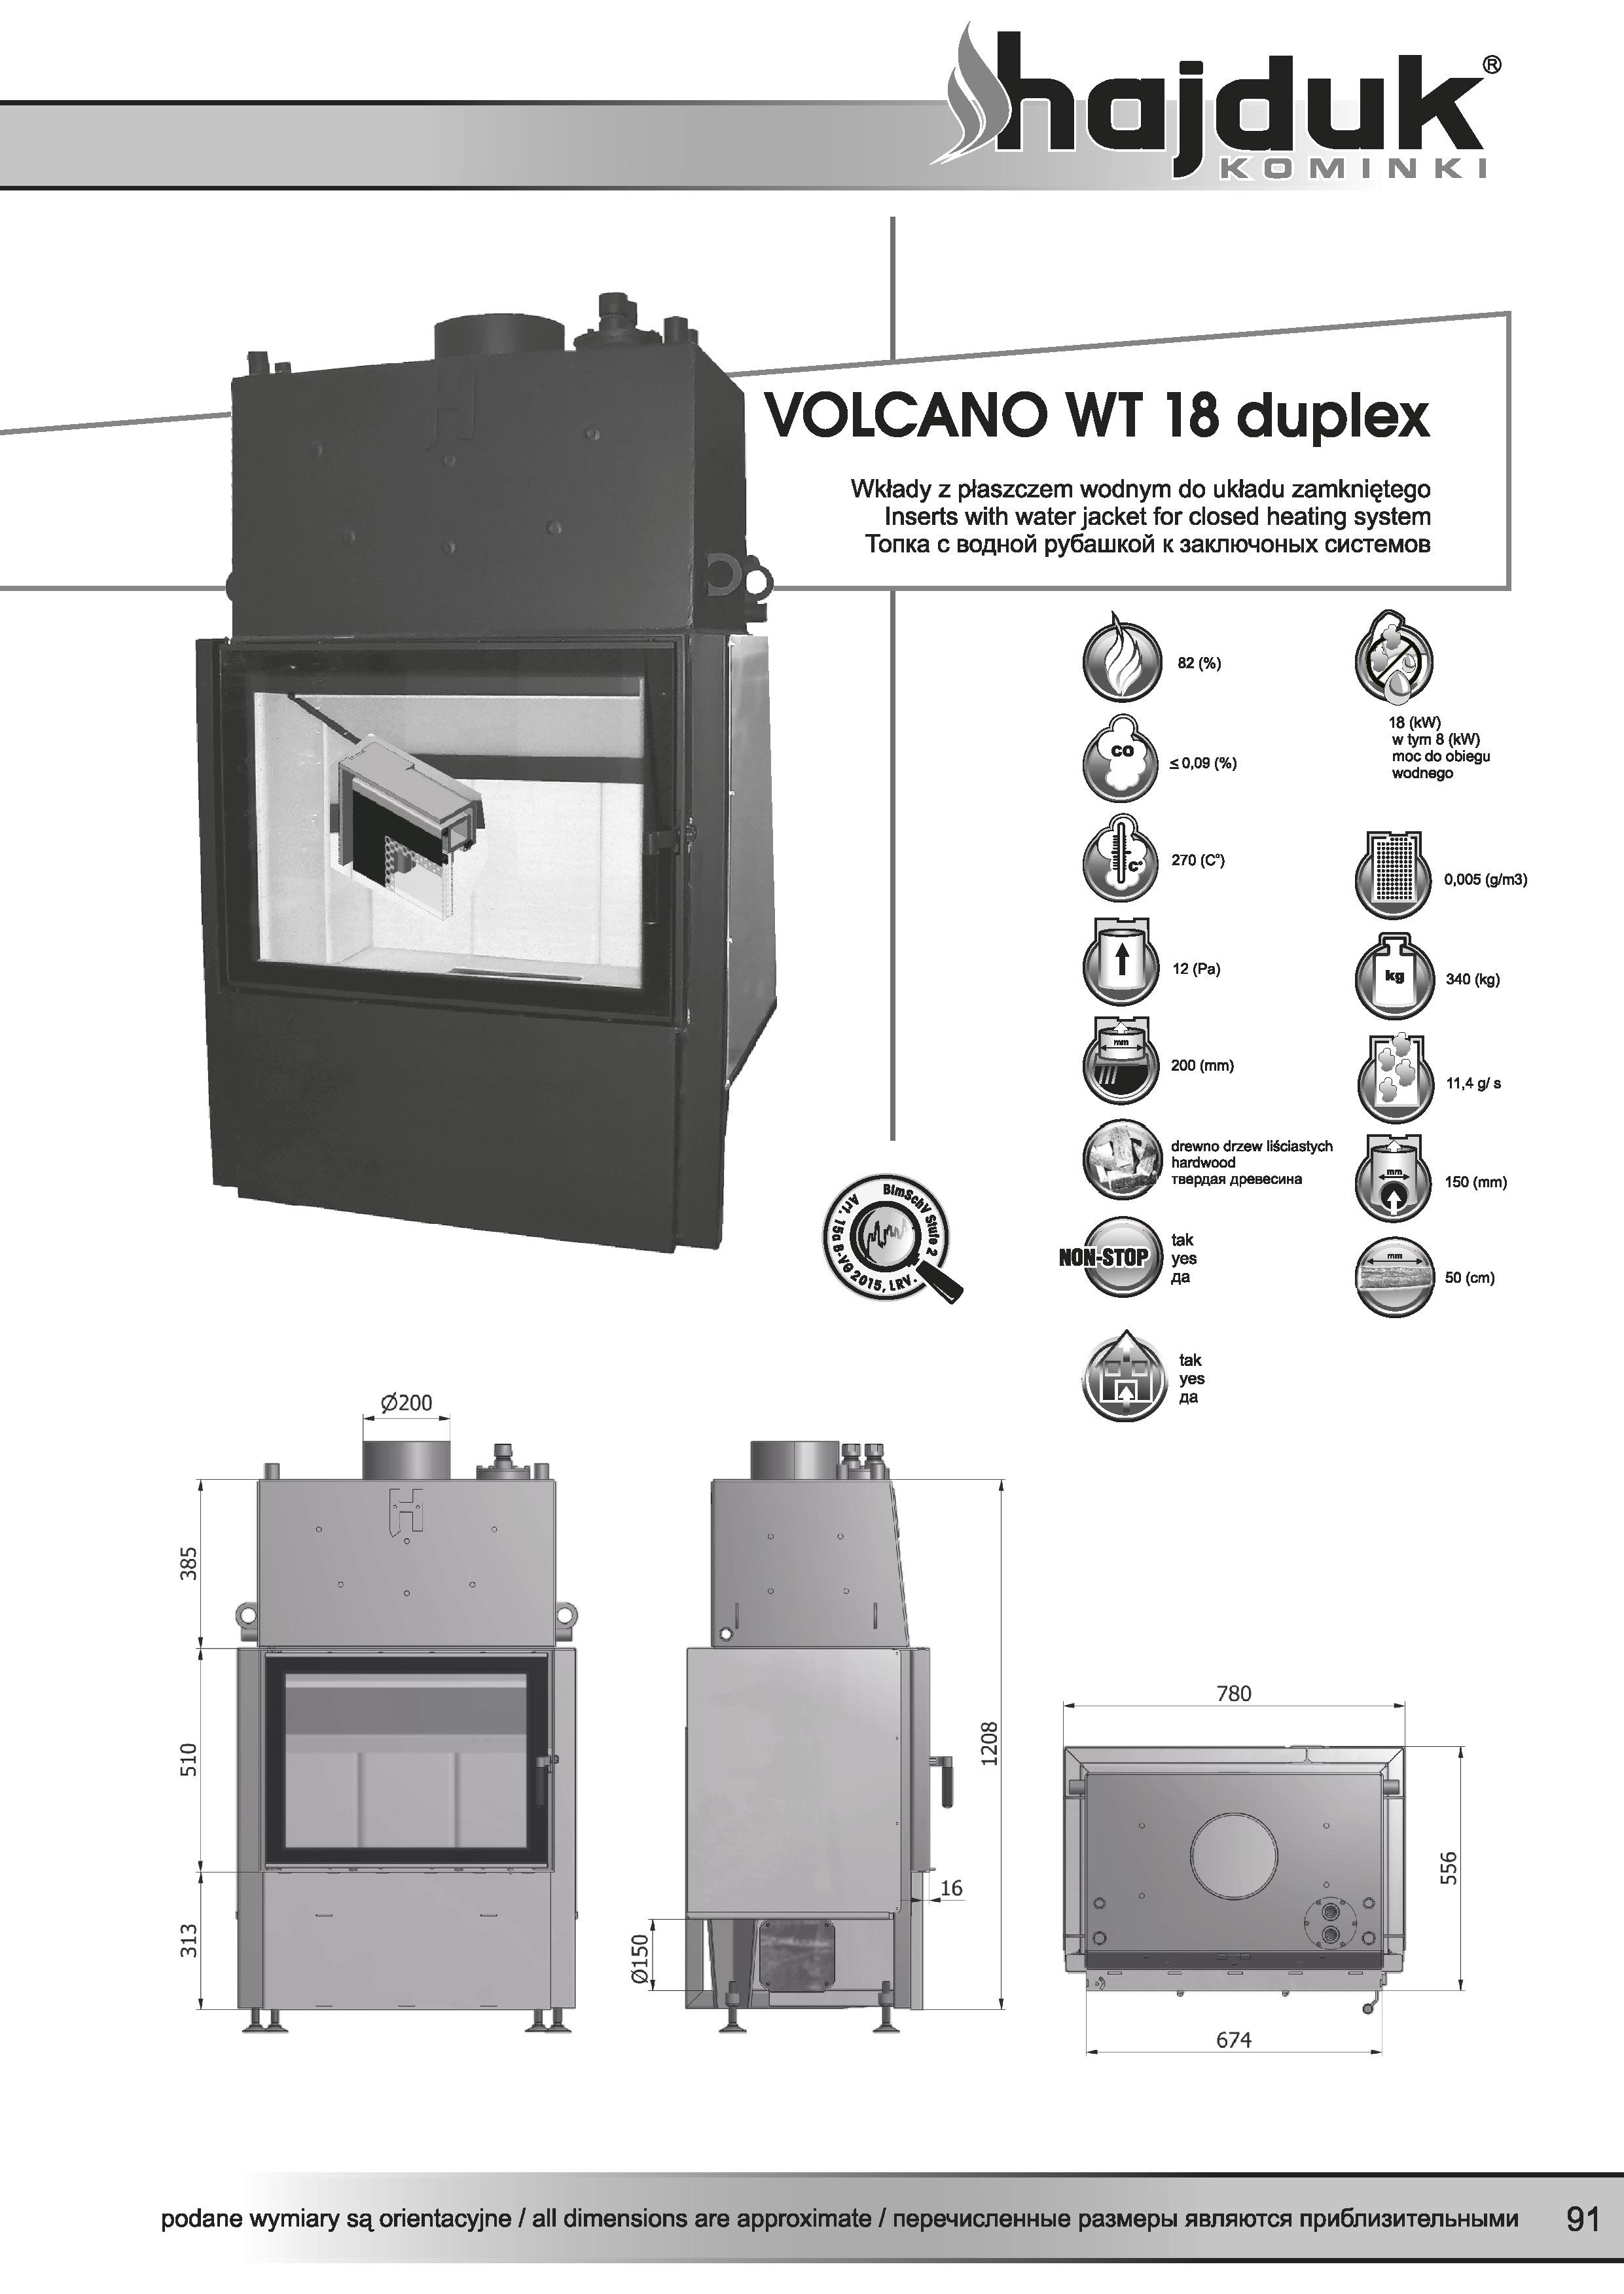 Volcano%20WT 18%20duplex%20 %20karta%20techniczna - Fireplace insert Hajduk Volcano WT 18